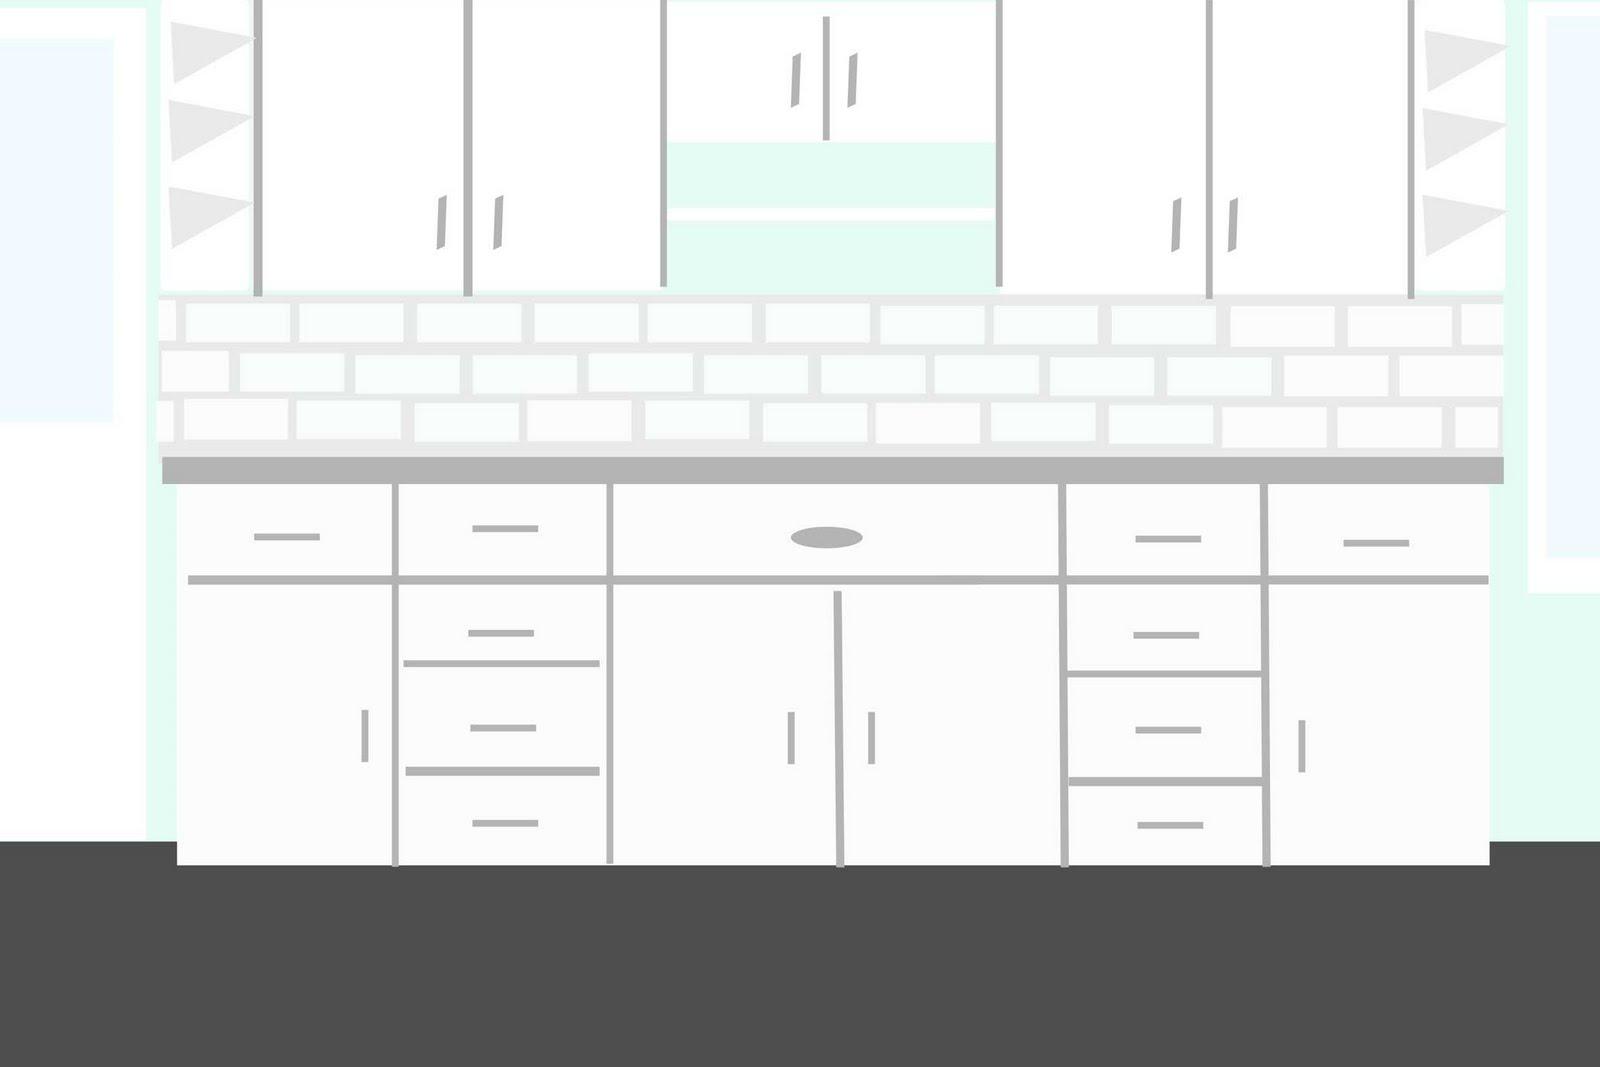 [wall-view-layout-1.jpg]